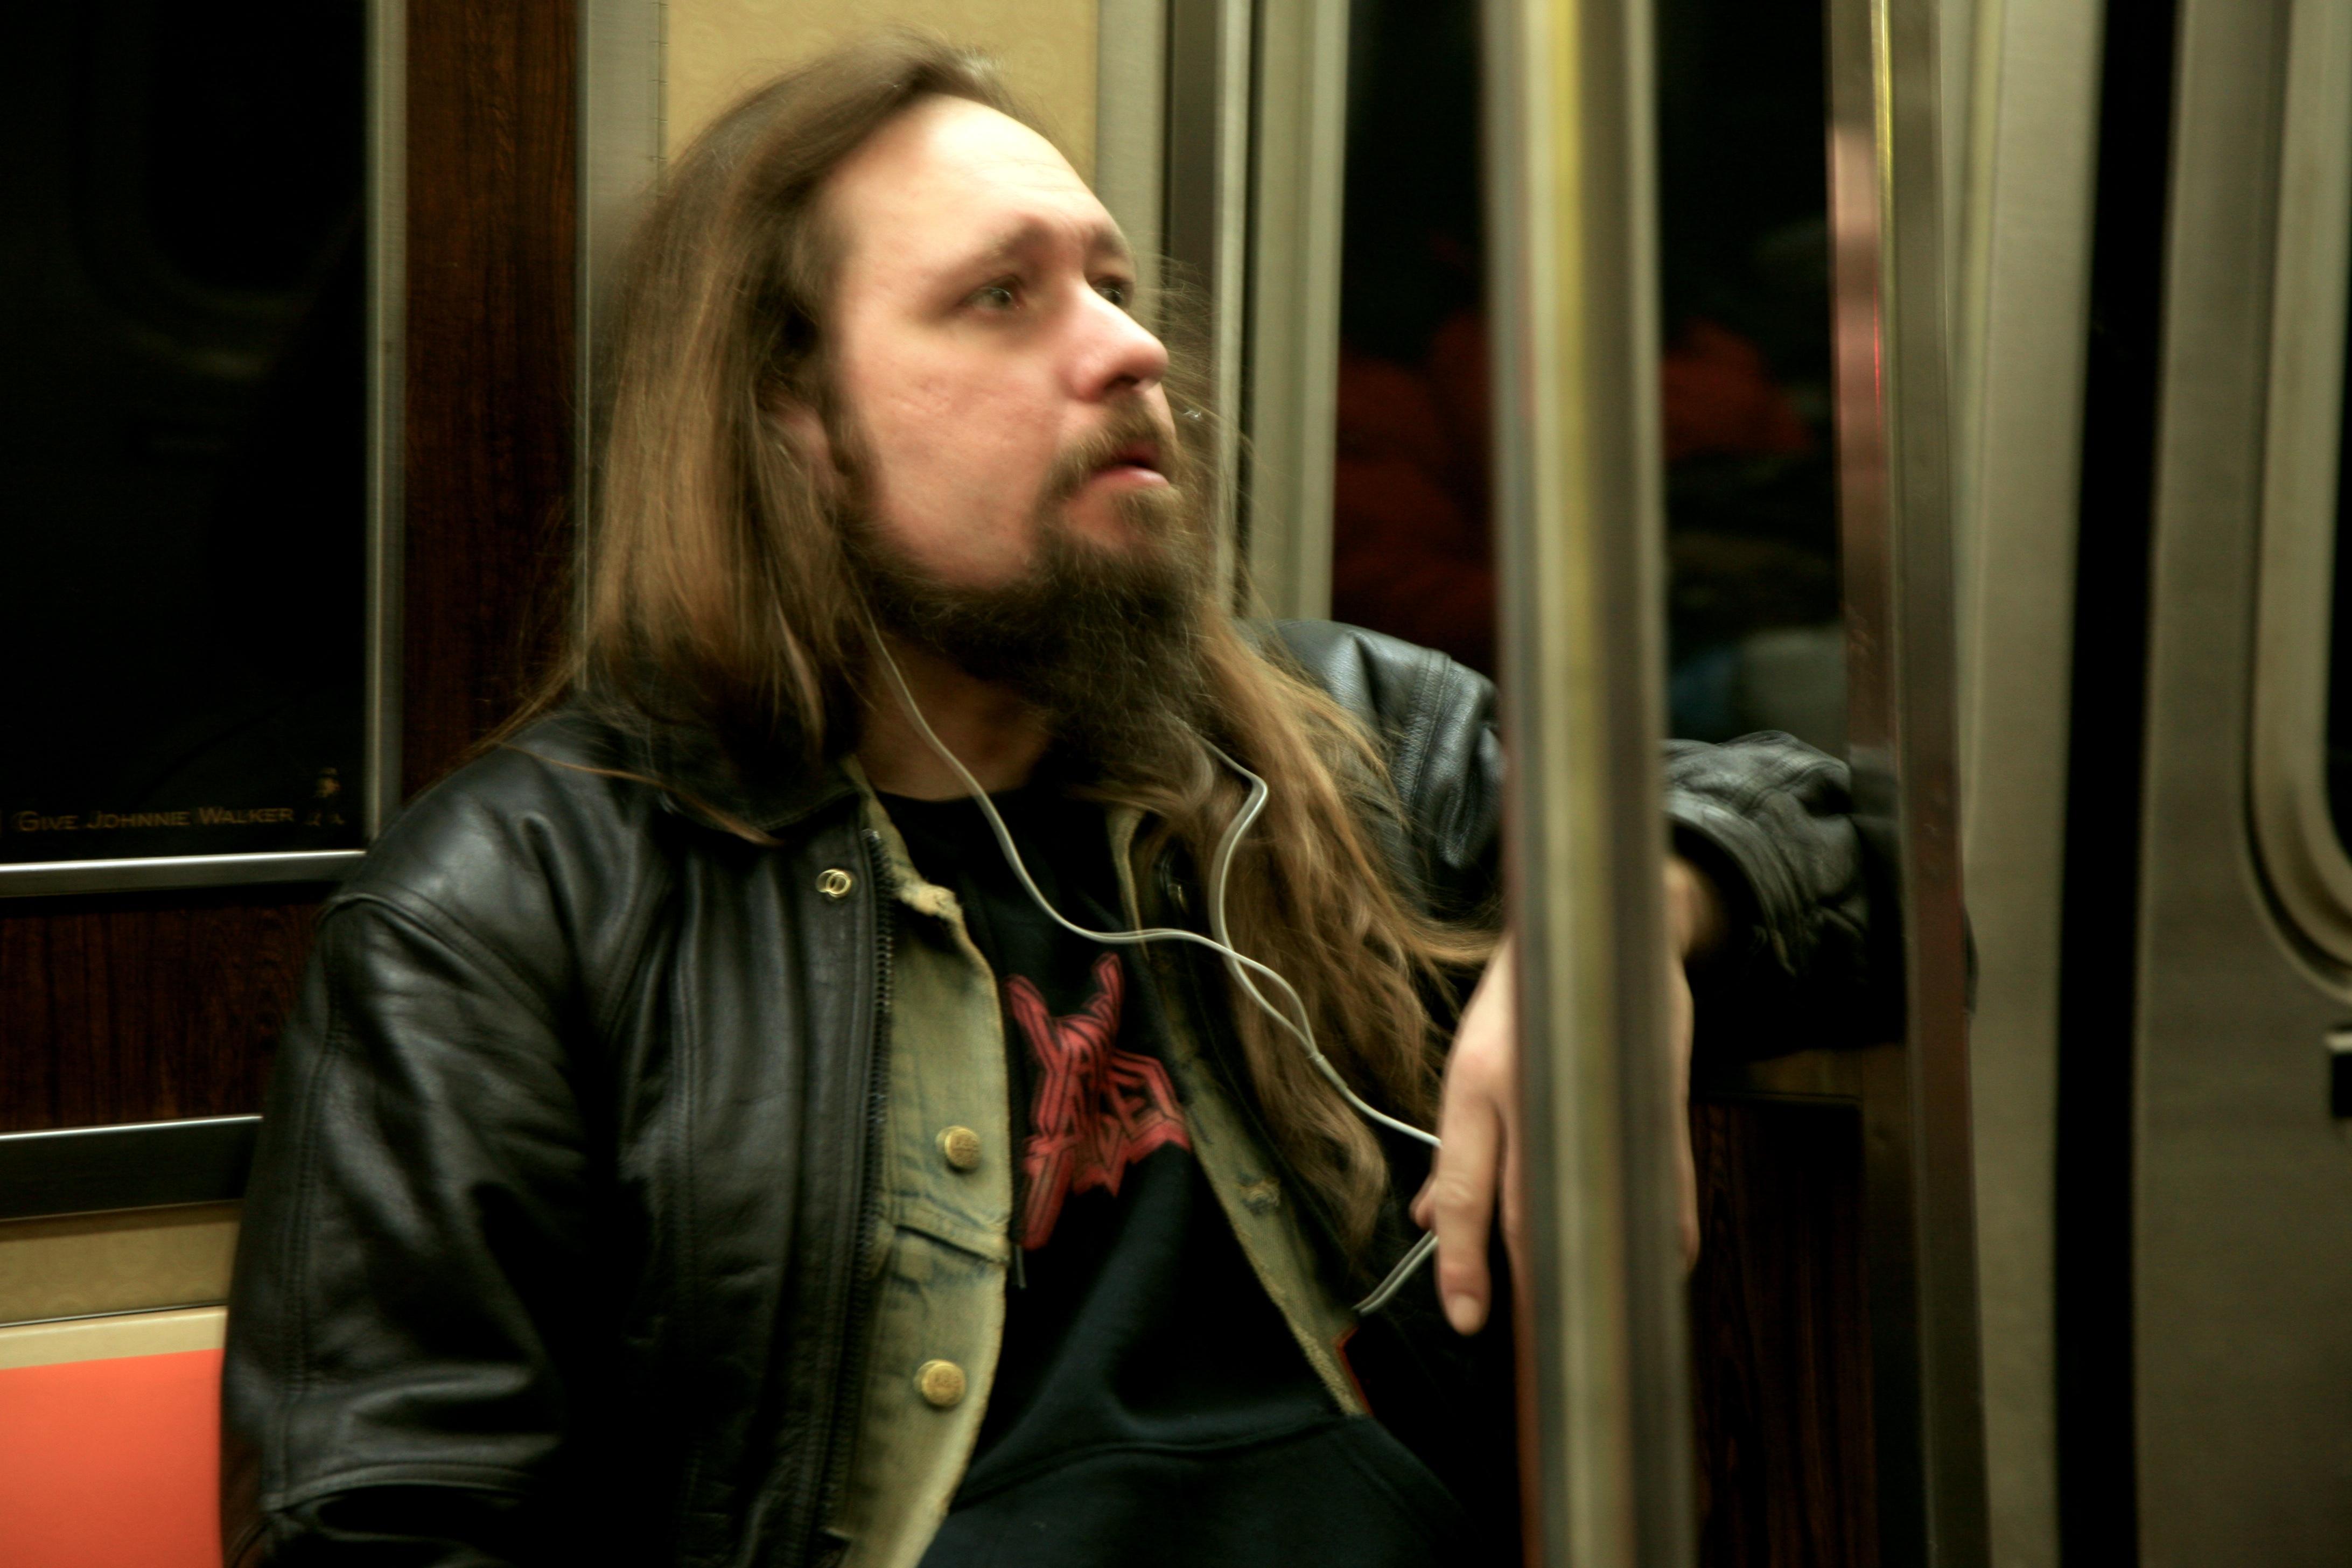 Free Images Person Subway Metro Nyc Metropolitan